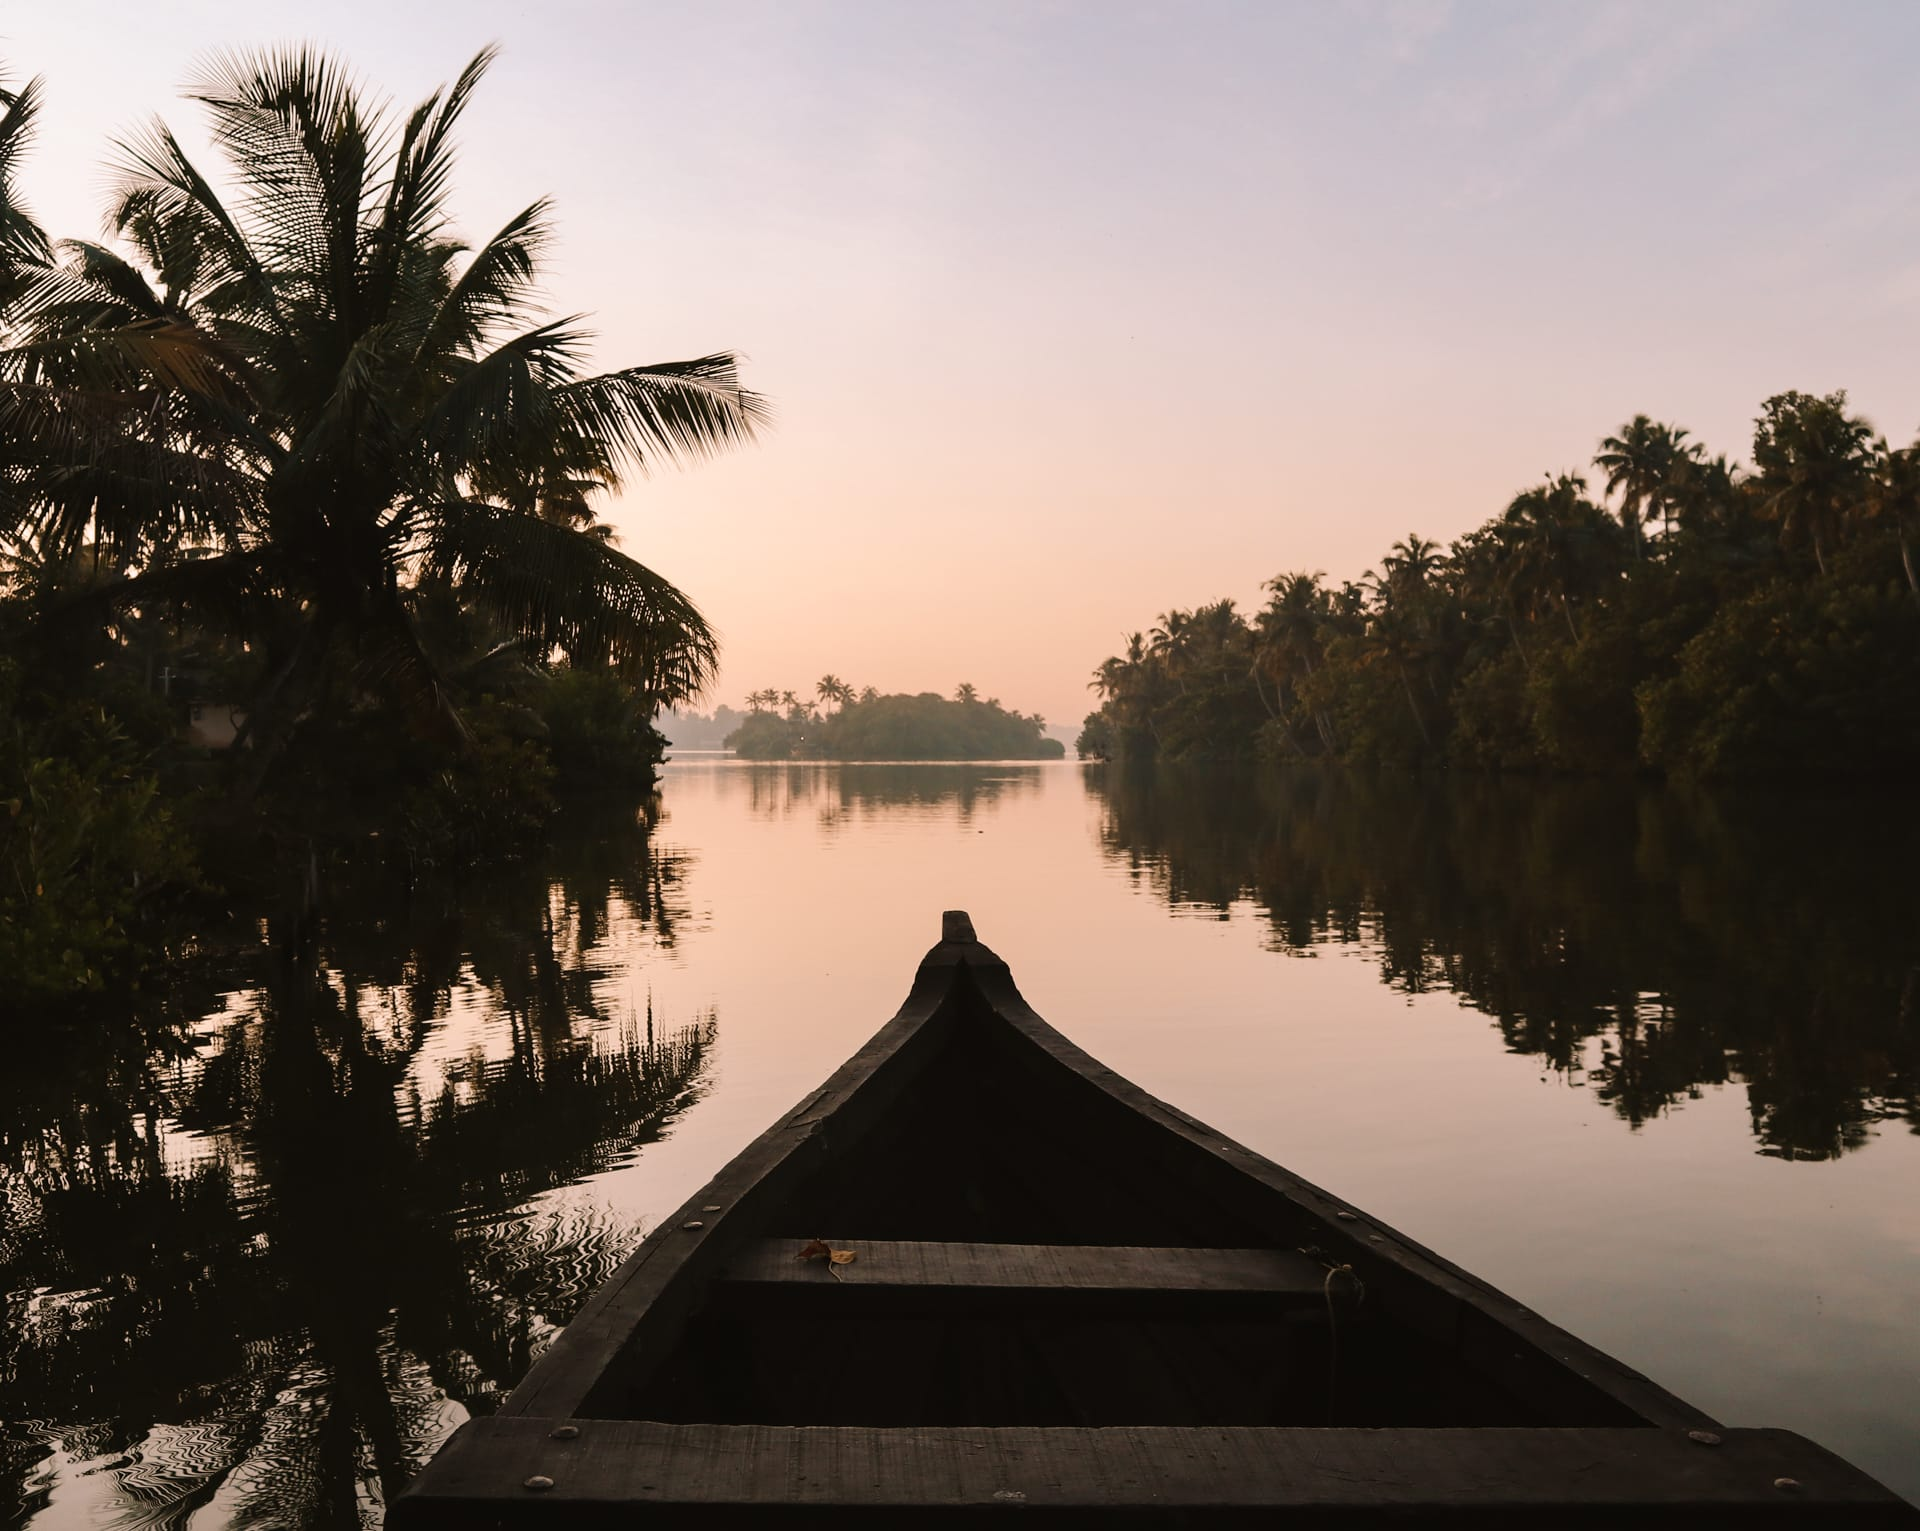 kerala india boat sunset